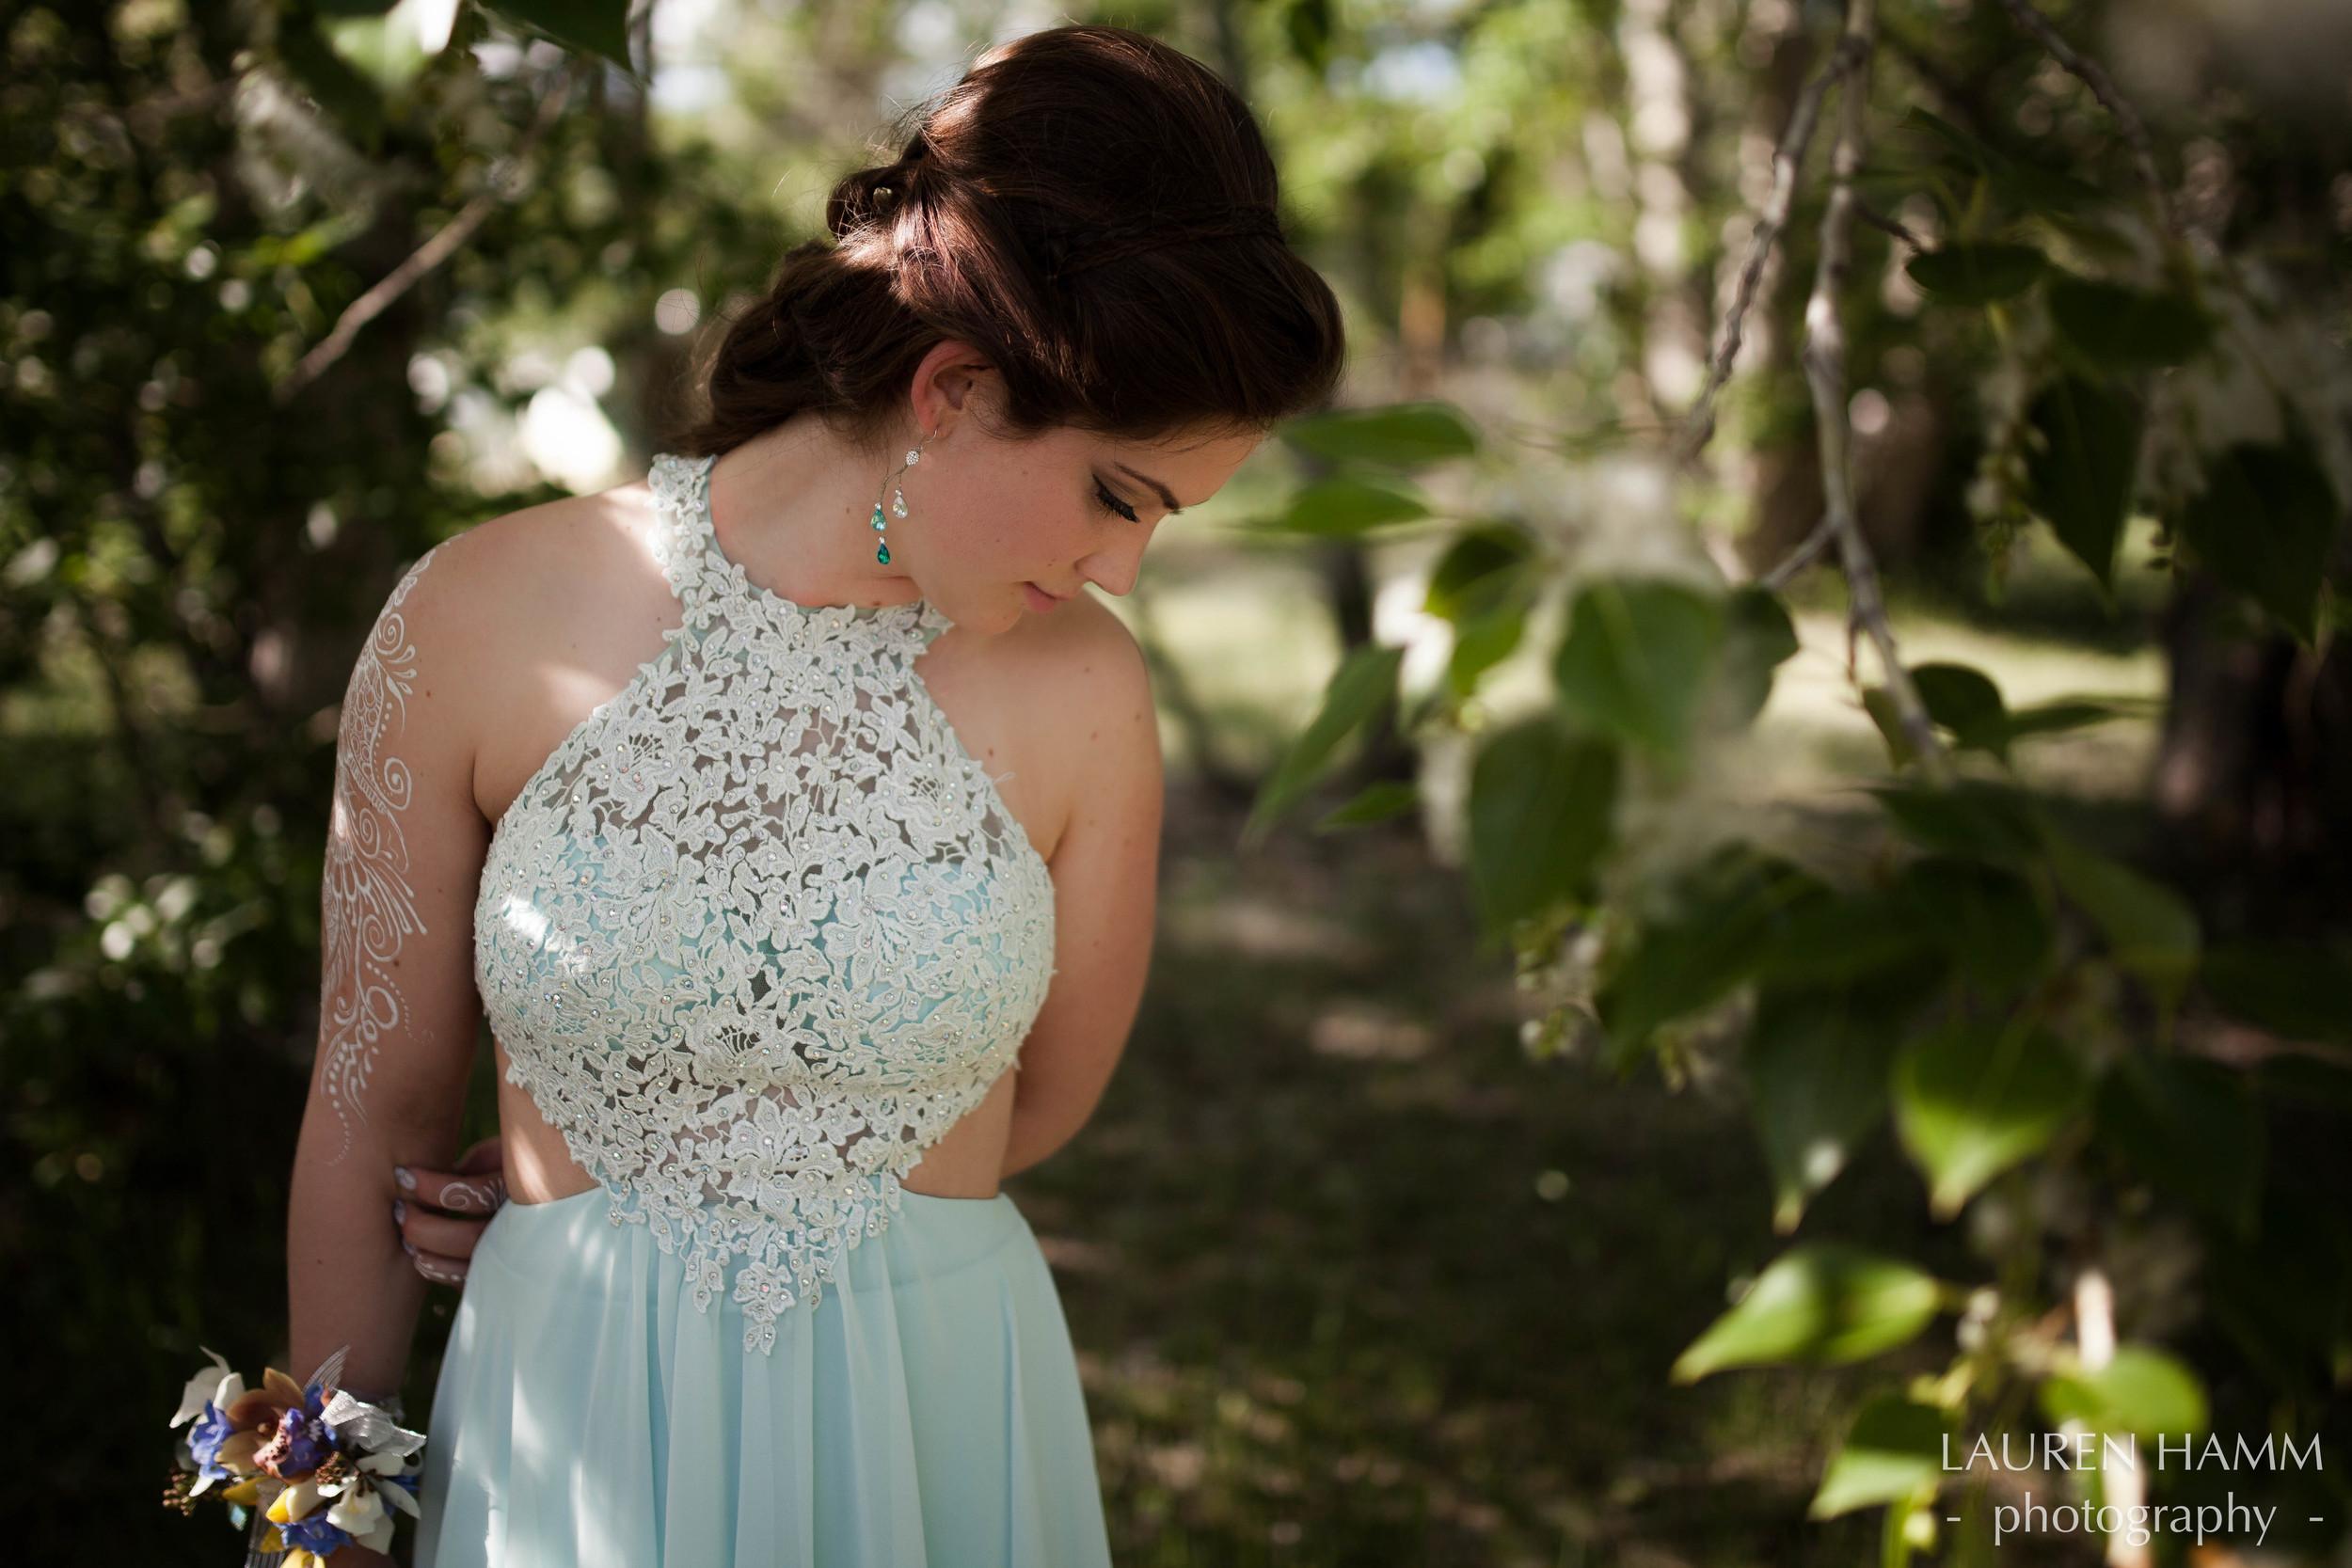 Karis Hilchey | Graduation | Alberta Photographer | YYC | Lauren Hamm Photography